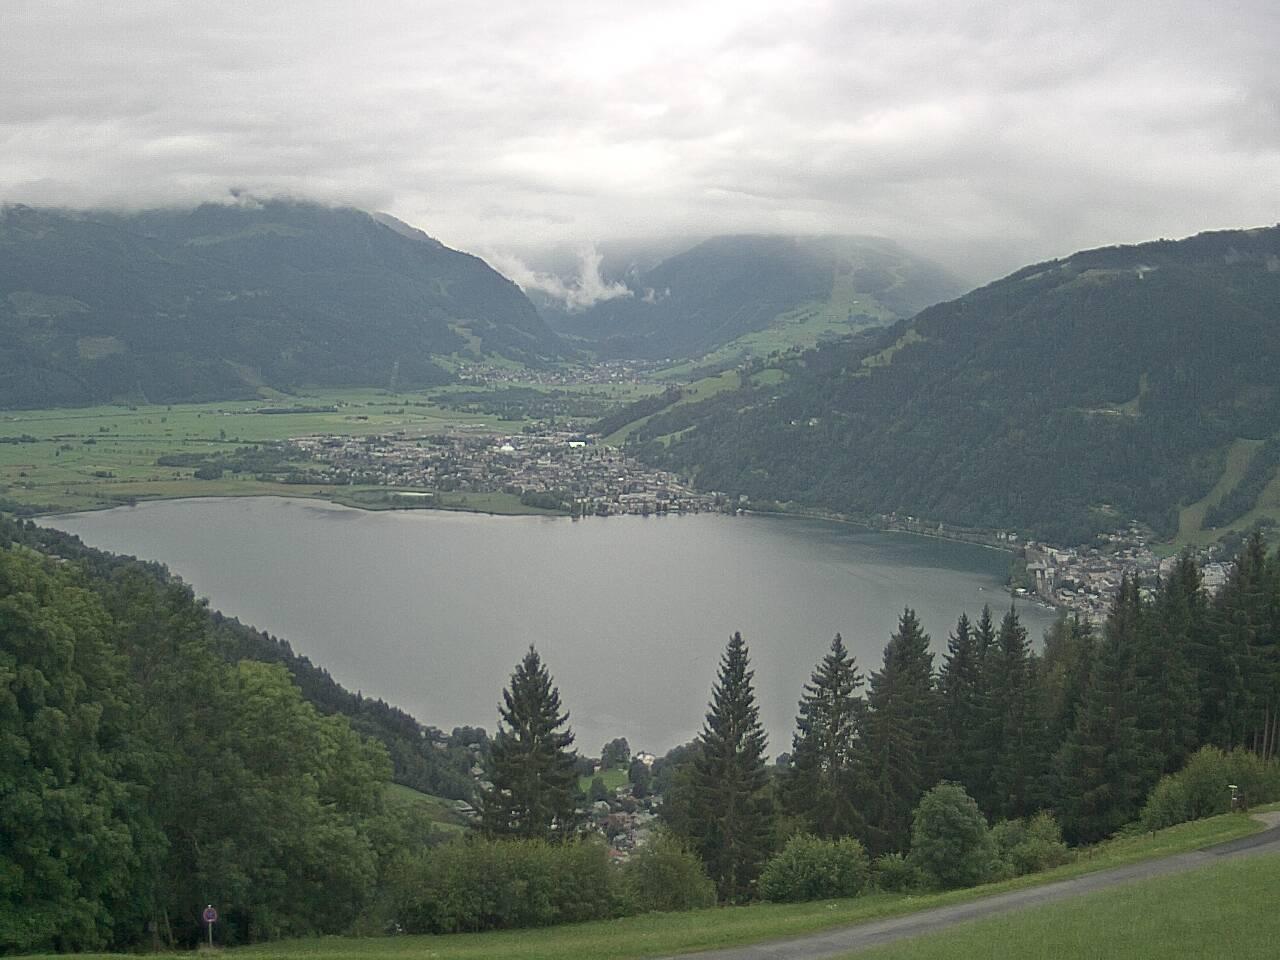 webcam : Blick auf Zell am See mit Zeller See